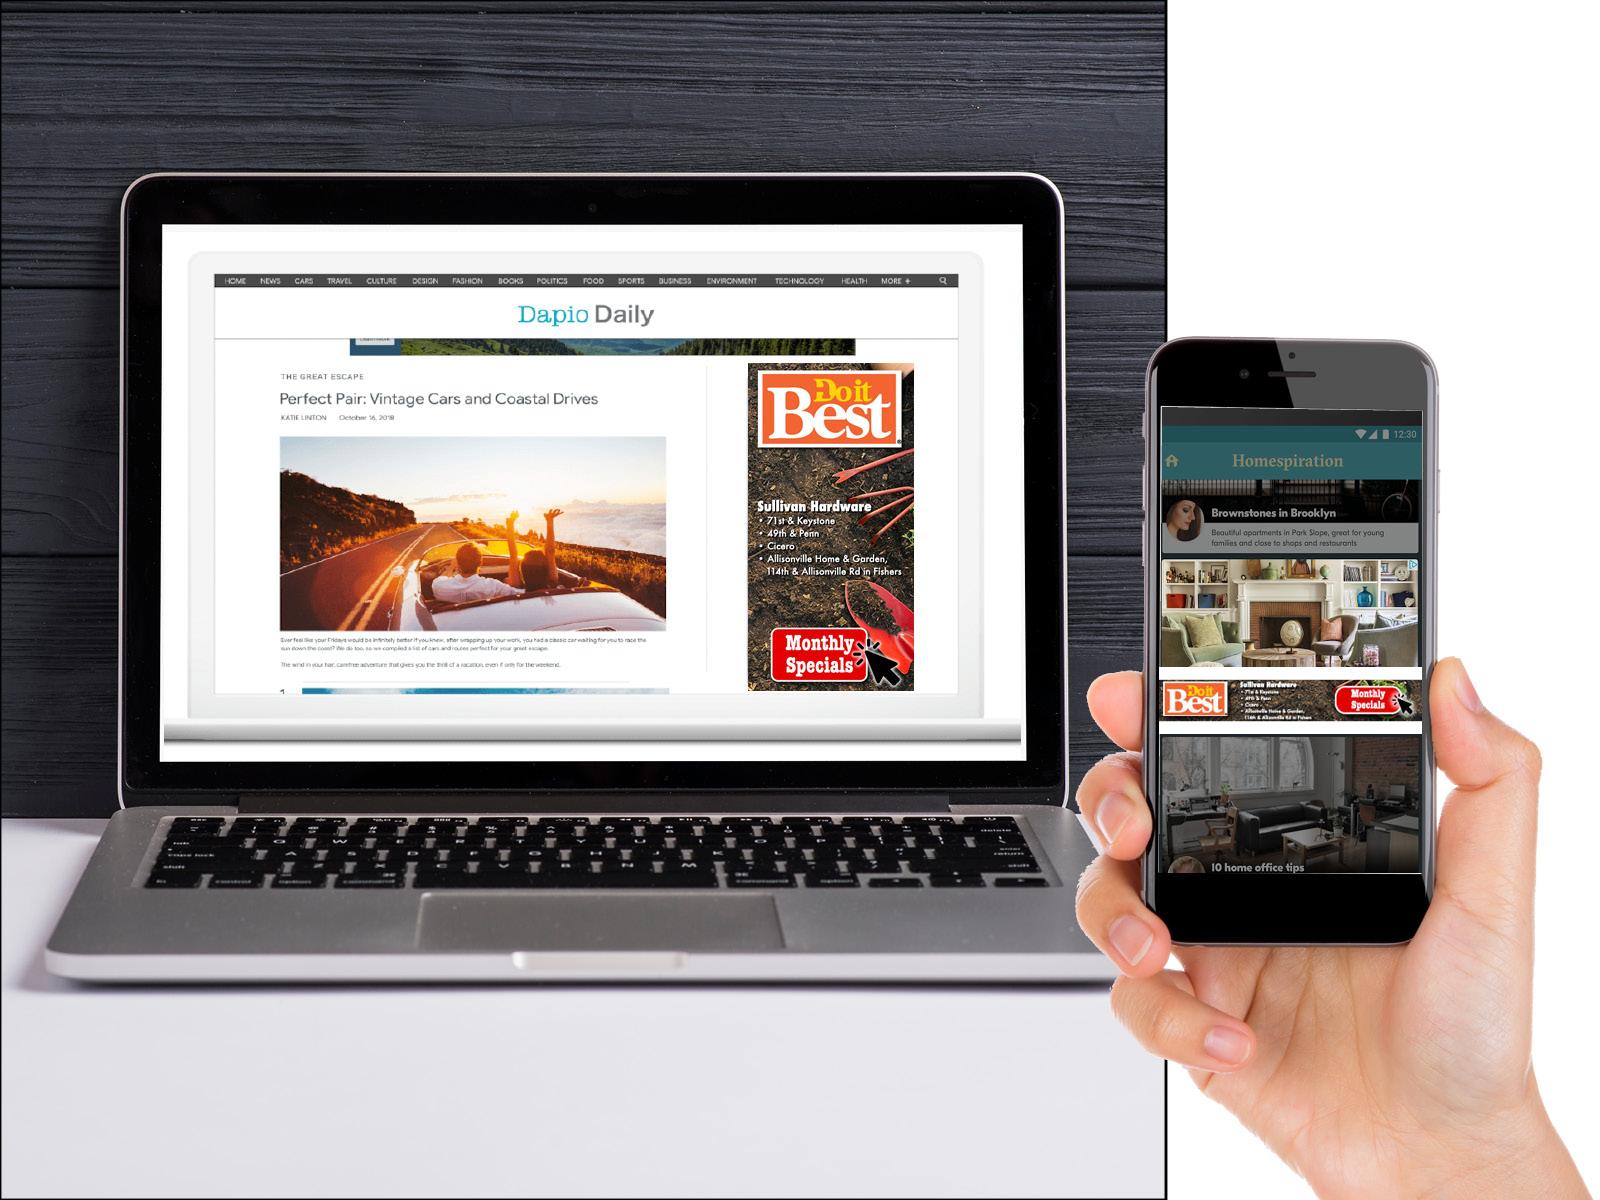 Sidebar Digital Display Ad Sample